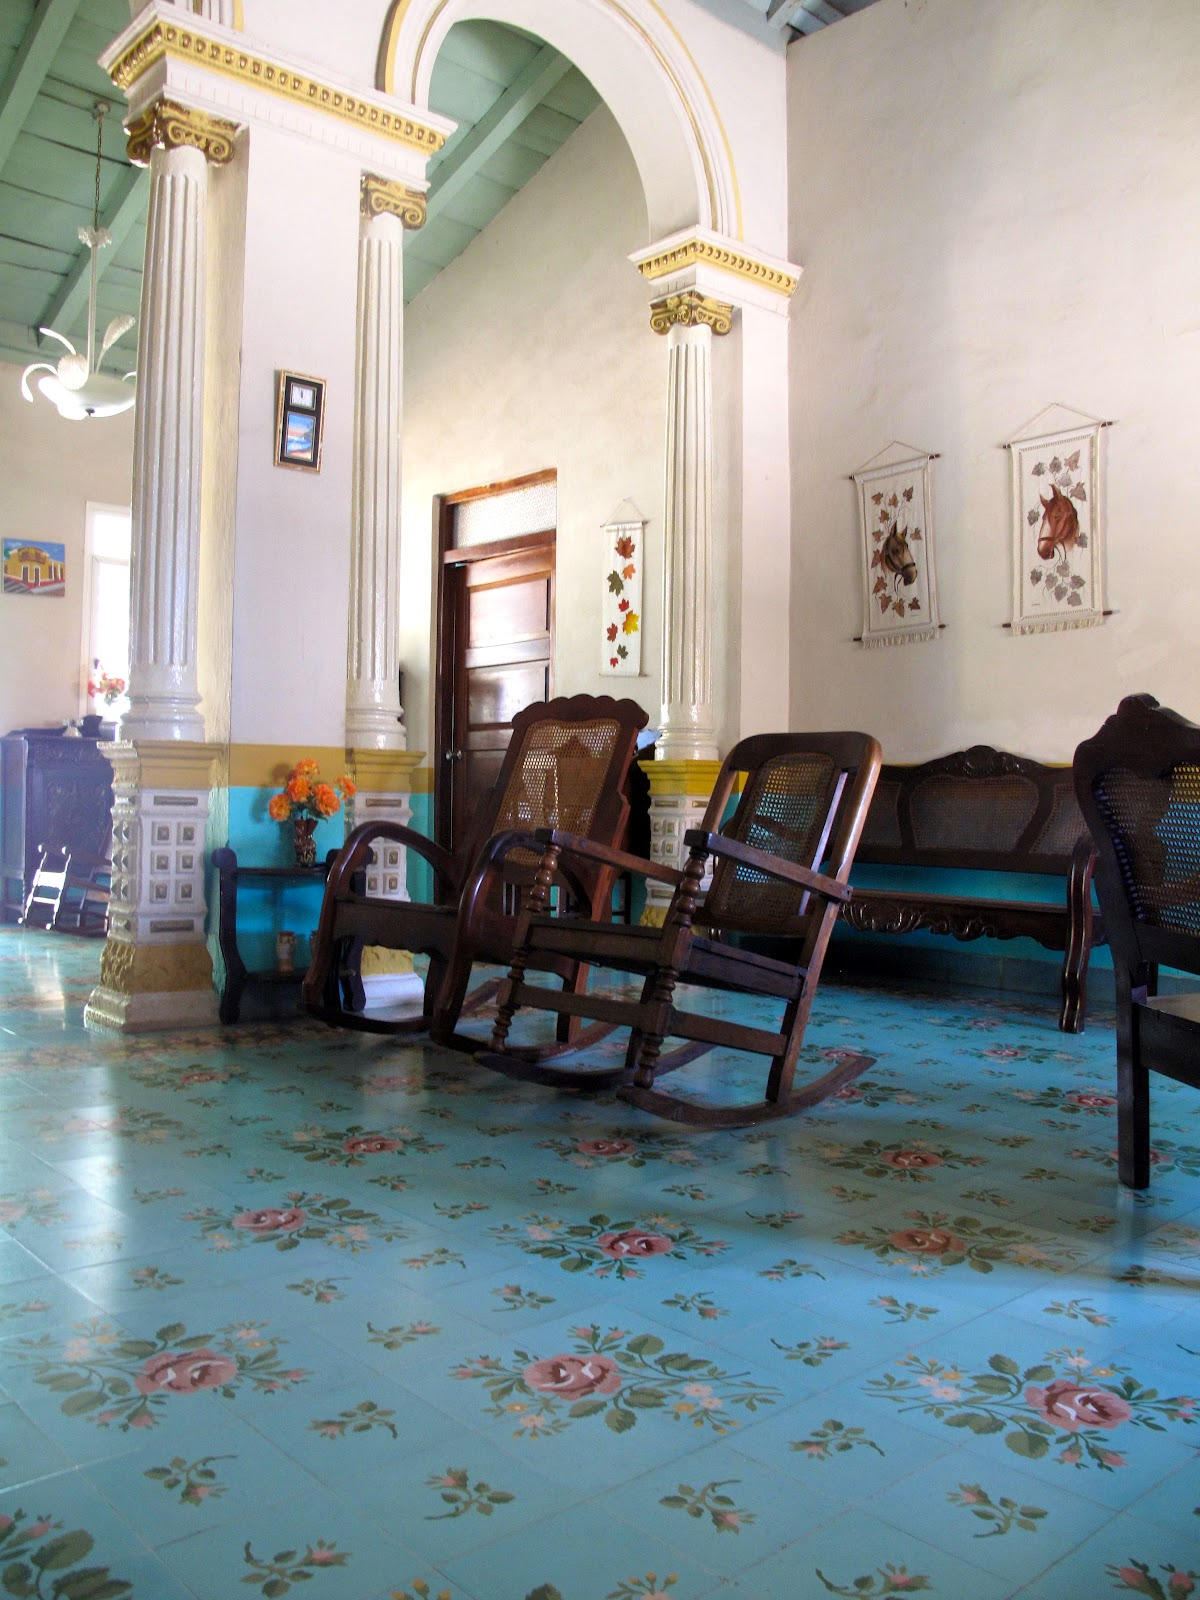 Design Interior Design Ideas For Small Design Living Room Ideas